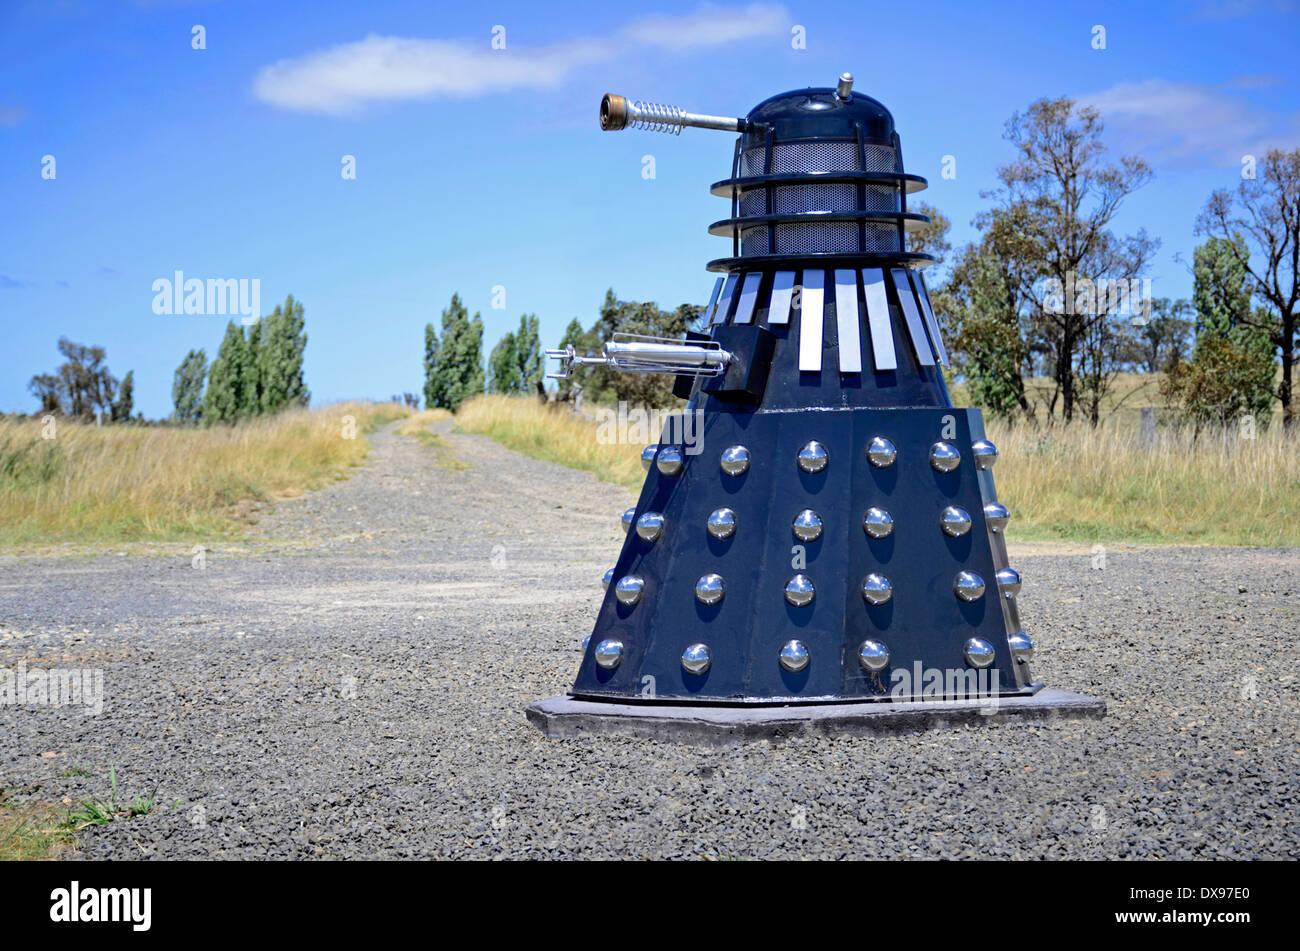 Unusual Dalek Roadside Mailbox - Stock Image